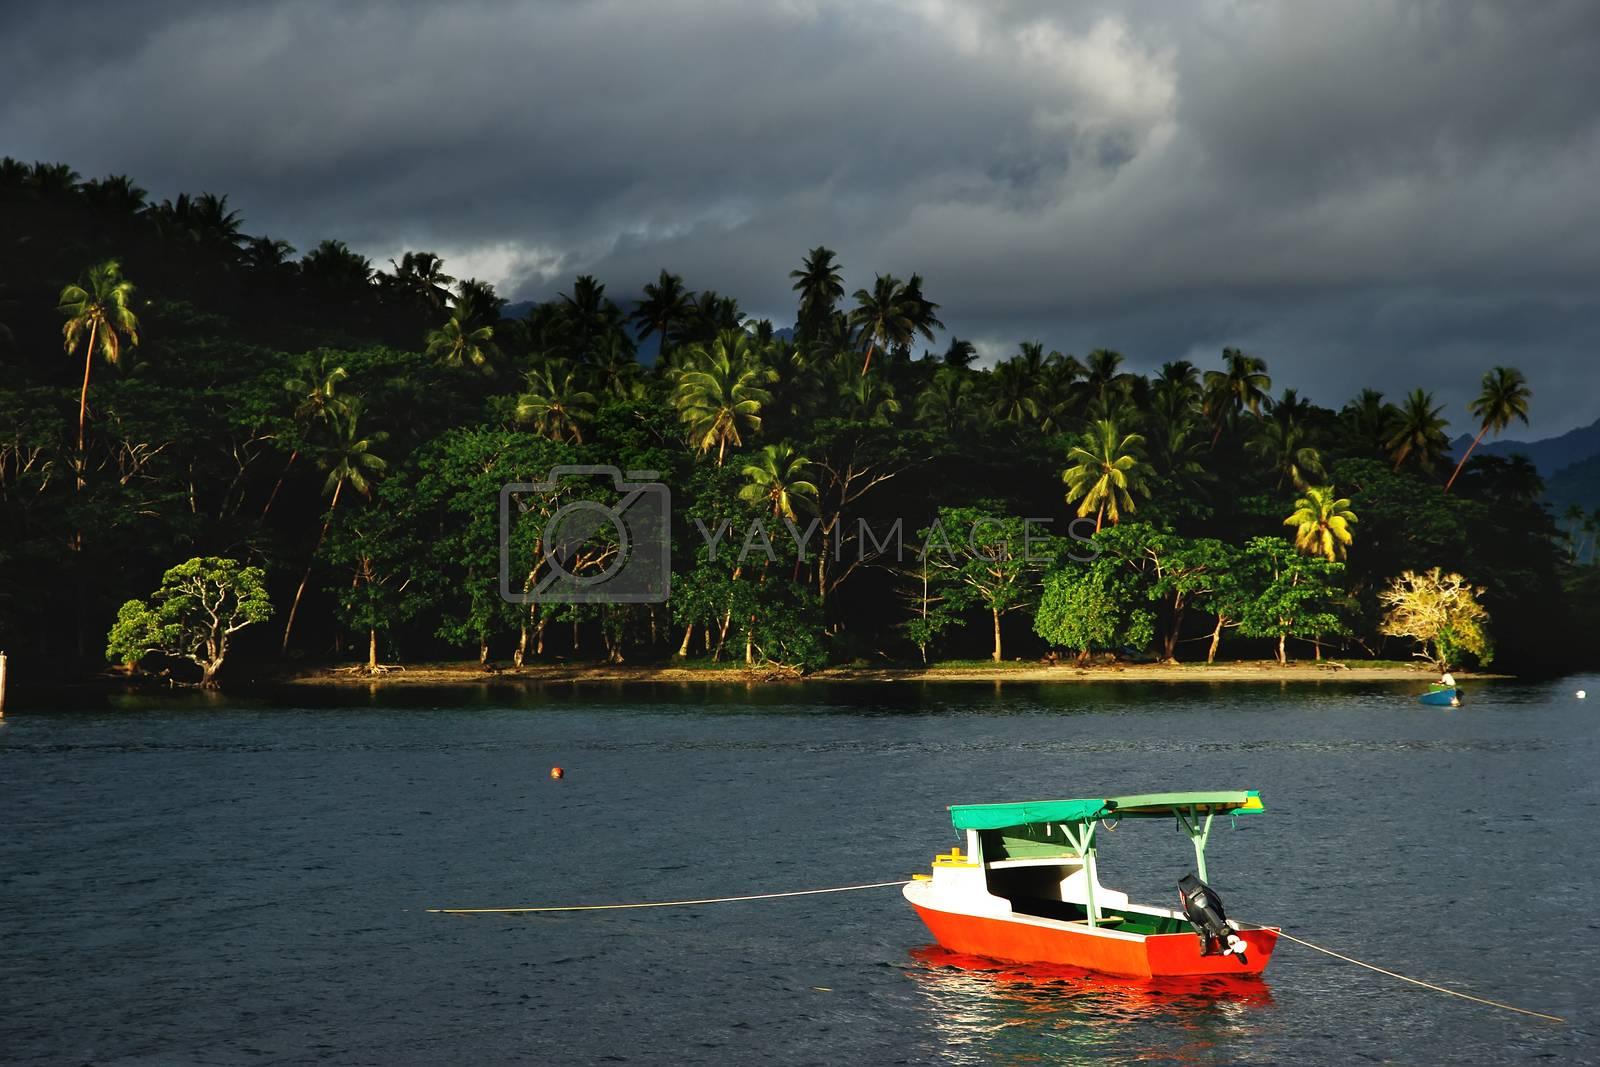 Royalty free image of Colorful boat at Savusavu harbor, Vanua Levu island, Fiji by donya_nedomam